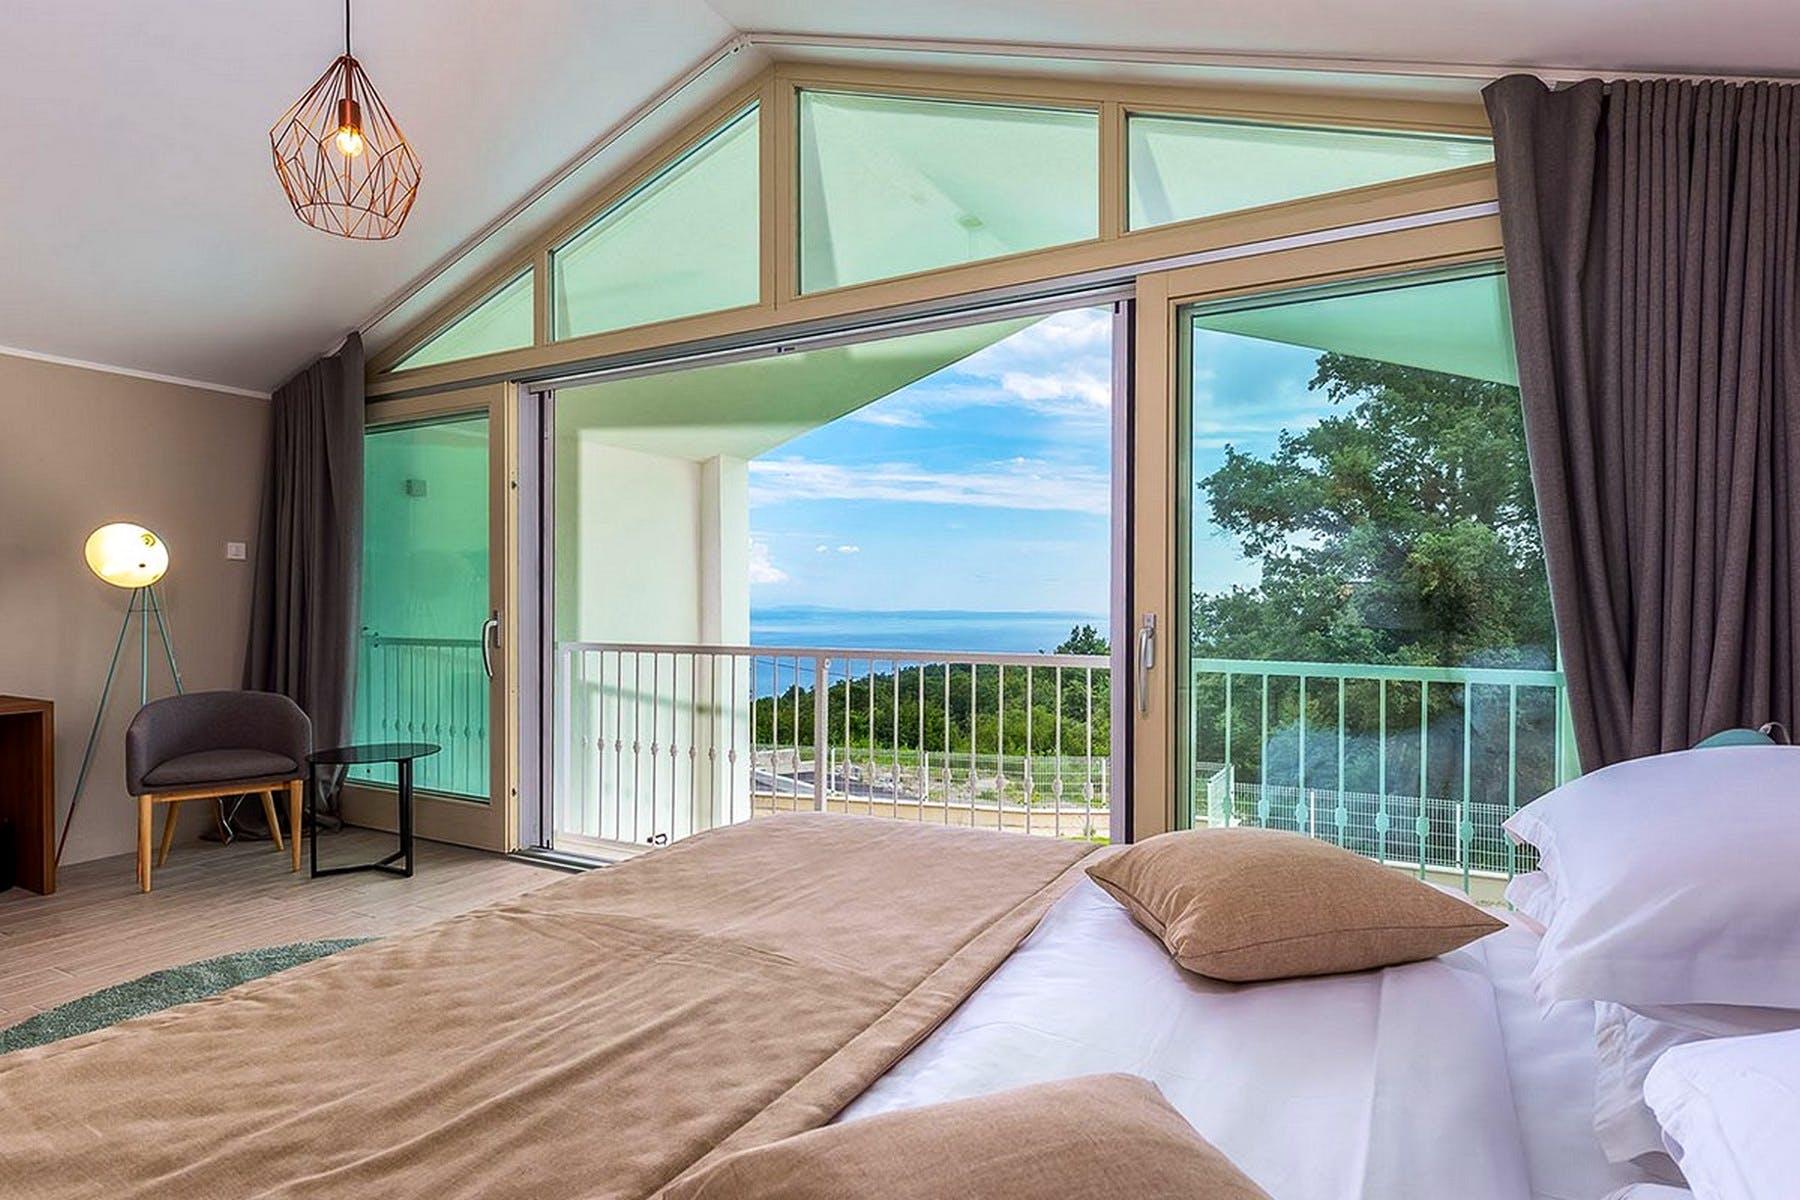 Pogled iz glavne spavaće sobe